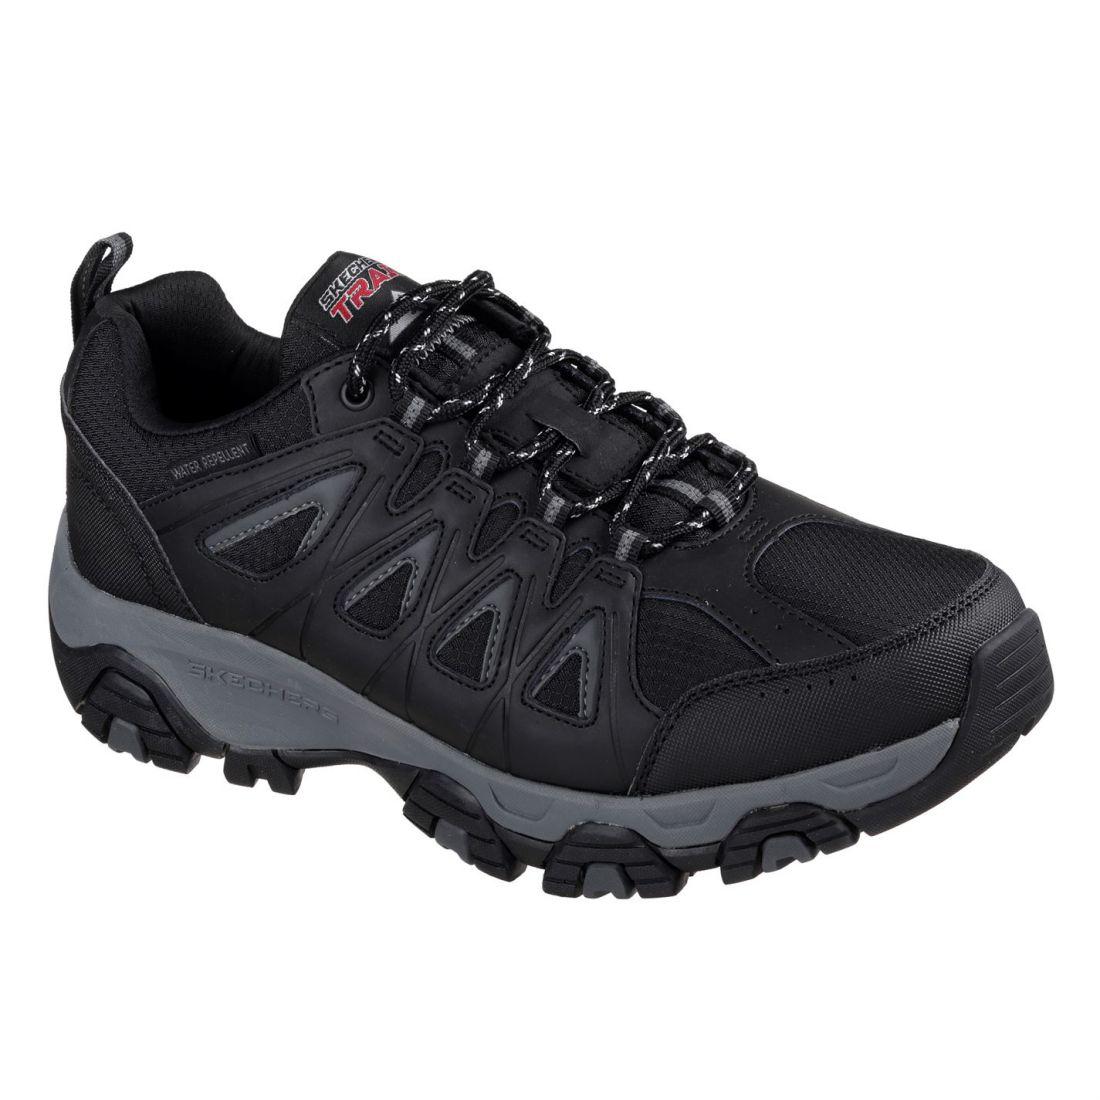 Skechers Terrabite Walking shoes Mens Gents Non Water Repellent Laces Fastened